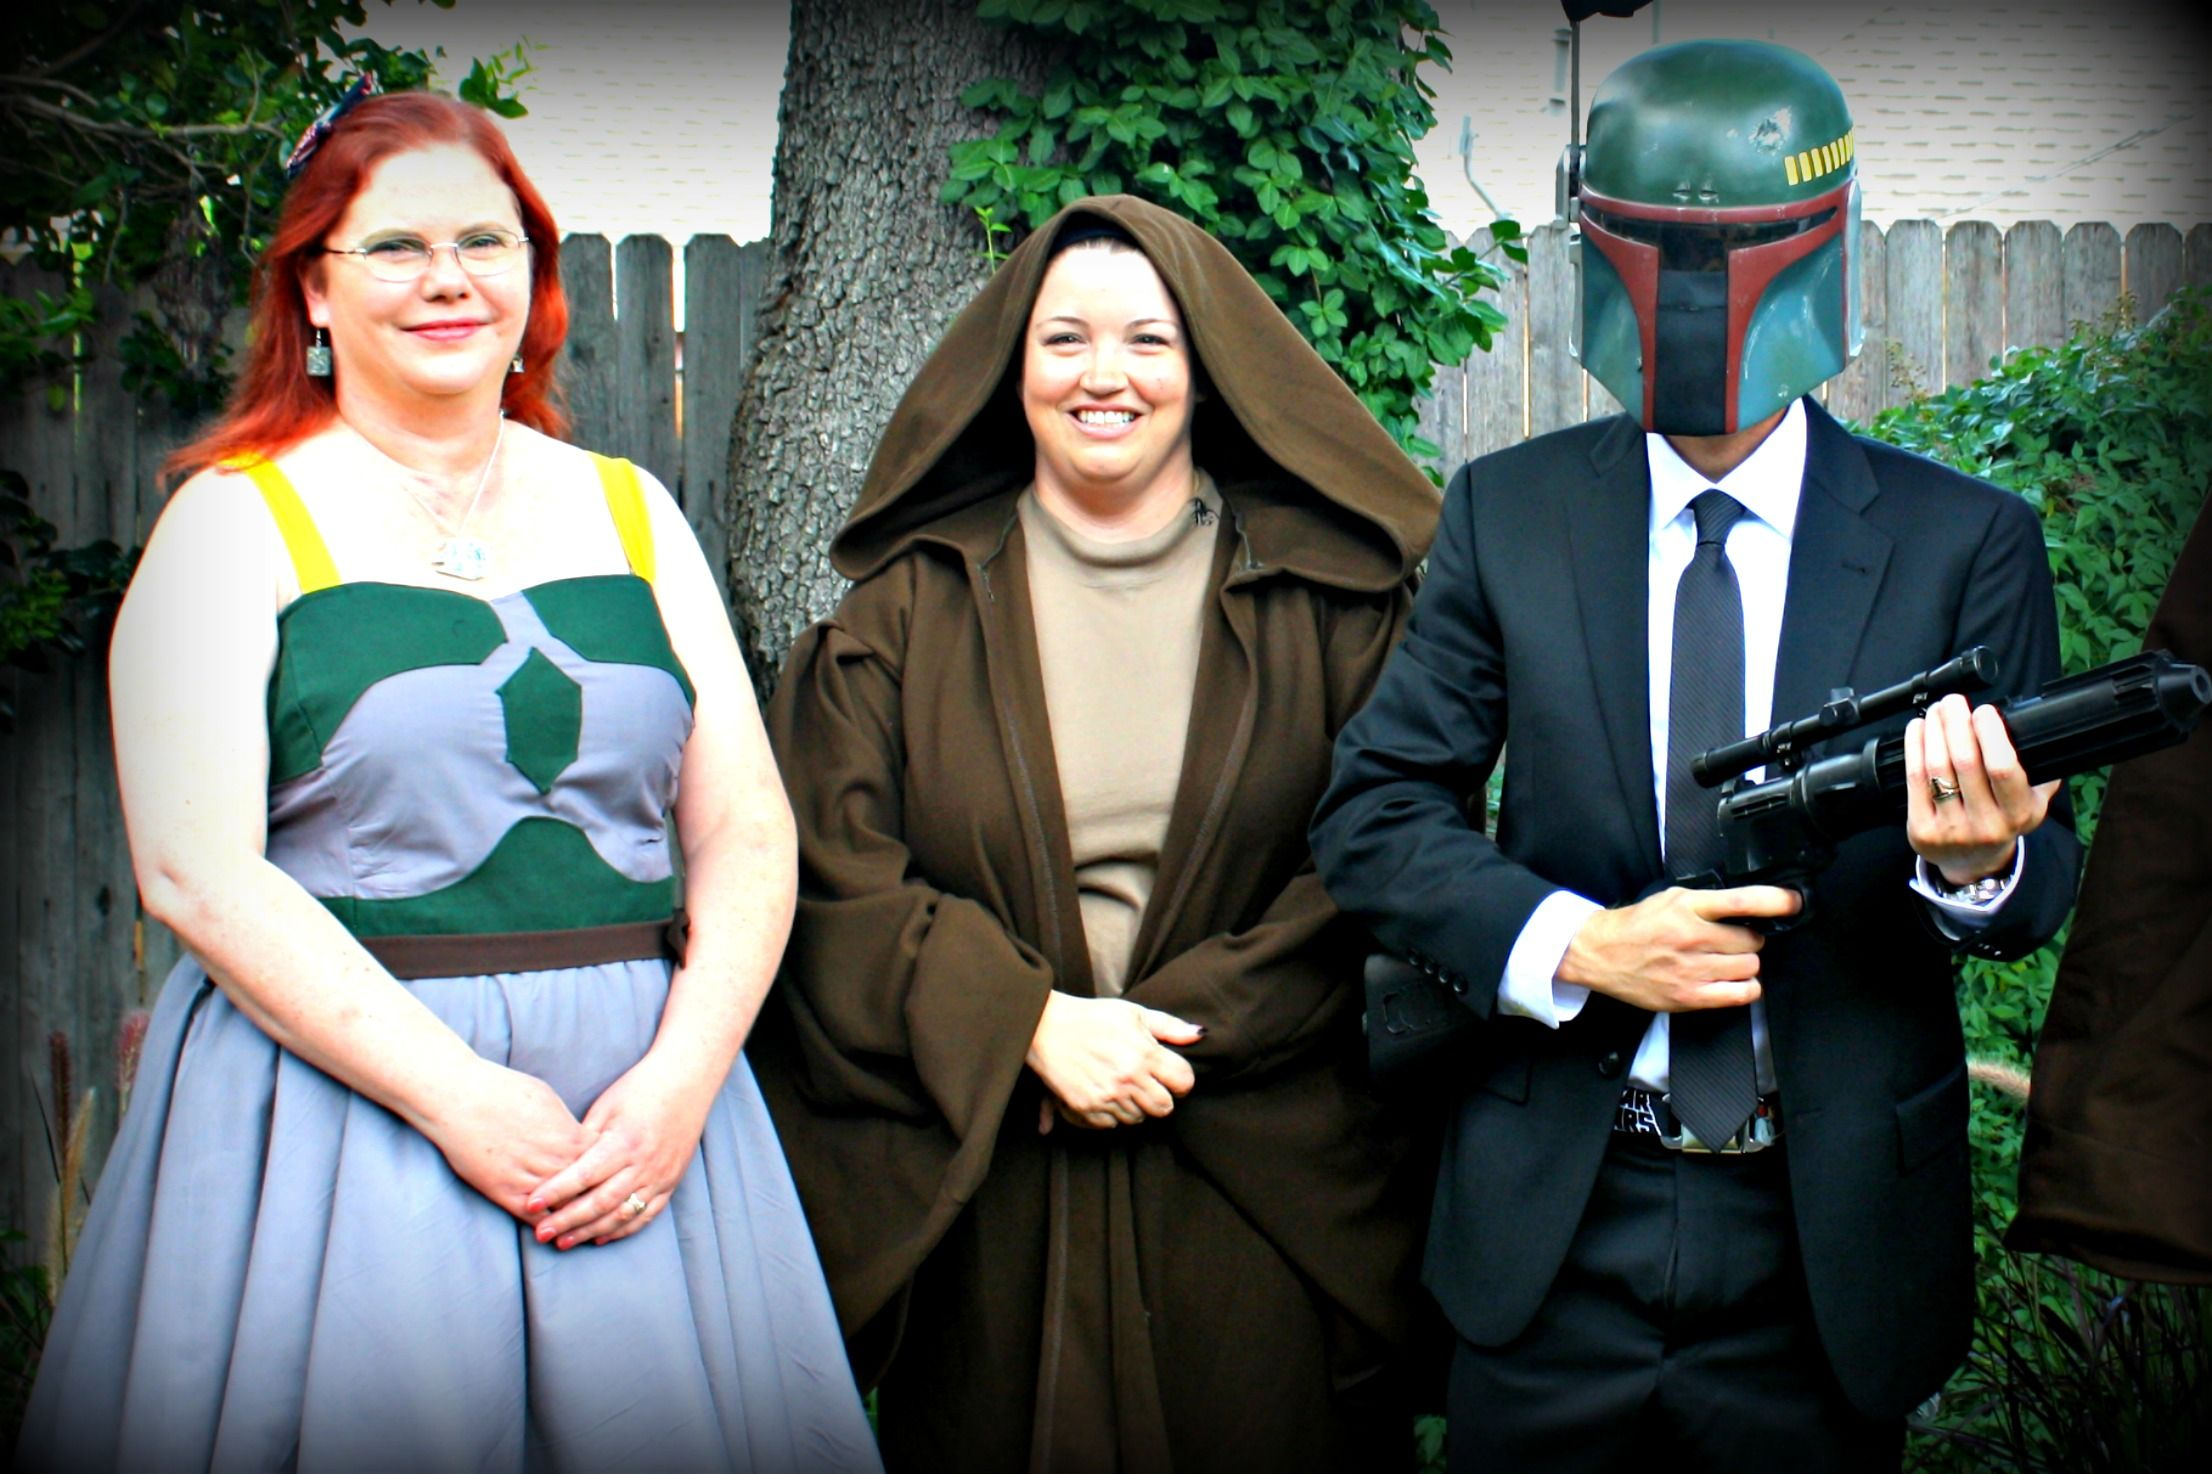 star wars wedding theme - Google Search